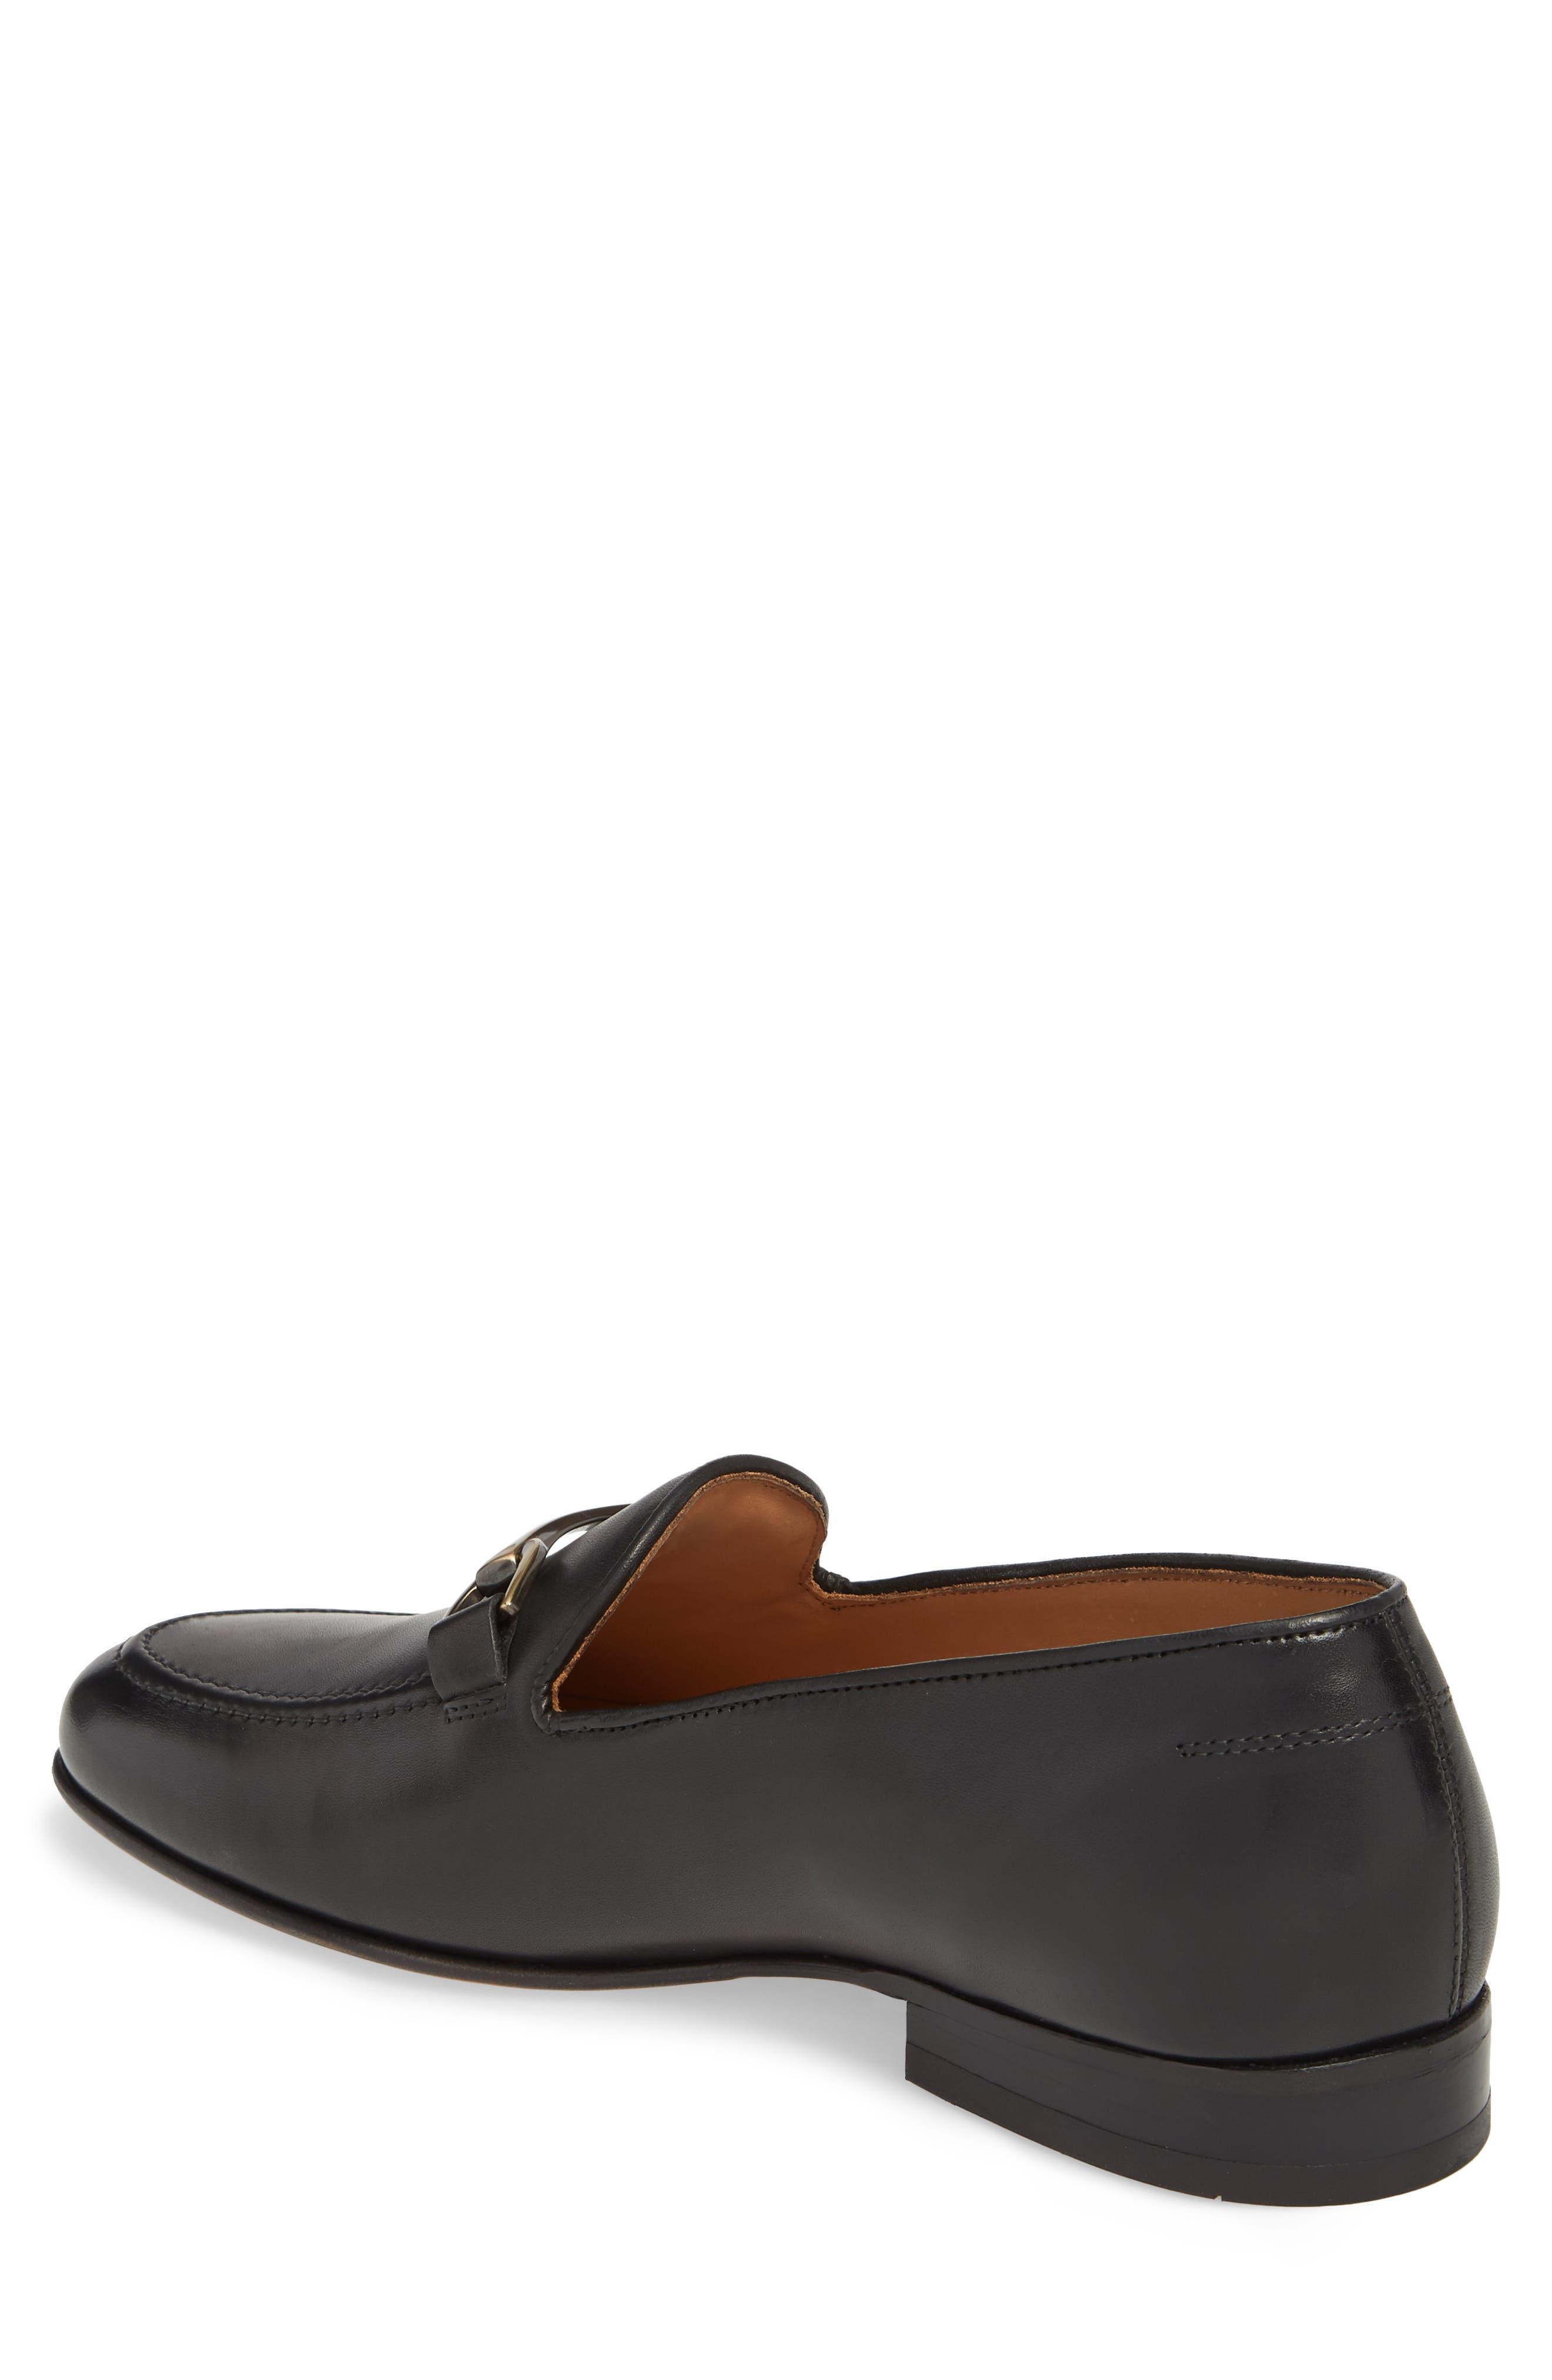 'Borcelo' Bit Loafer,                             Alternate thumbnail 2, color,                             Black Leather